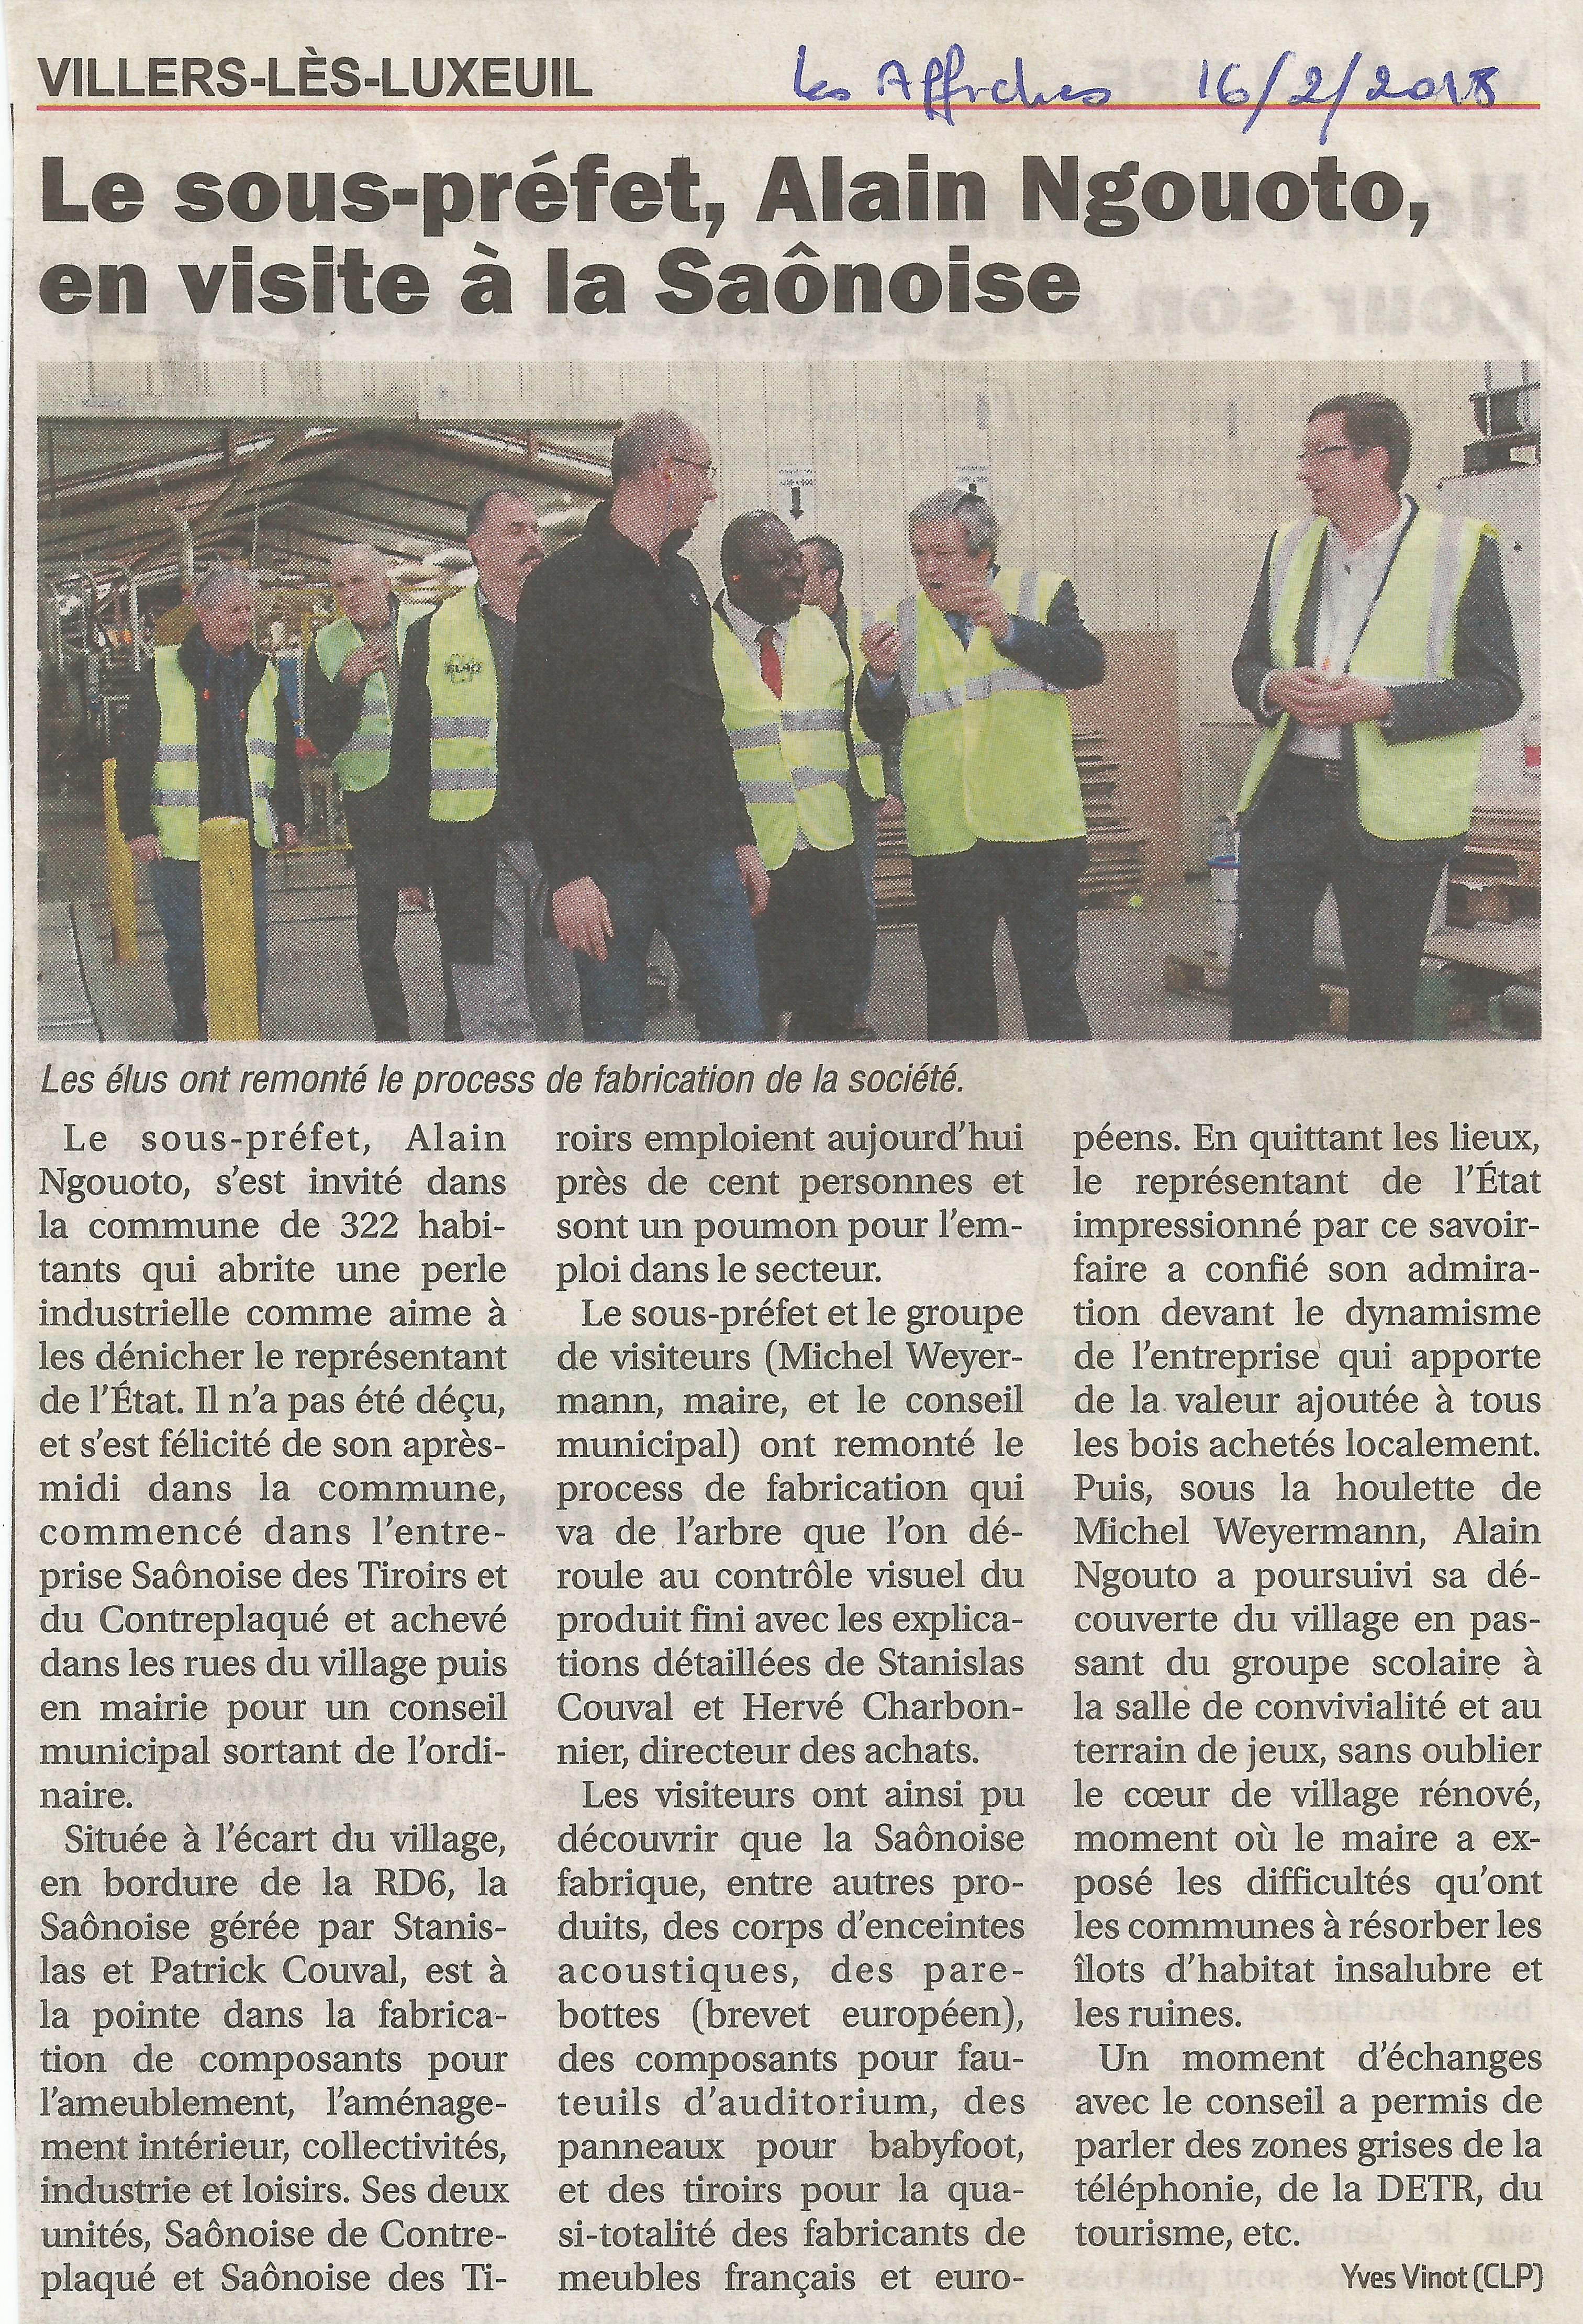 https://www.villers-les-luxeuil.com/projets/villers/files/images/2018_Mairie/Presse/2018_02_16.jpg